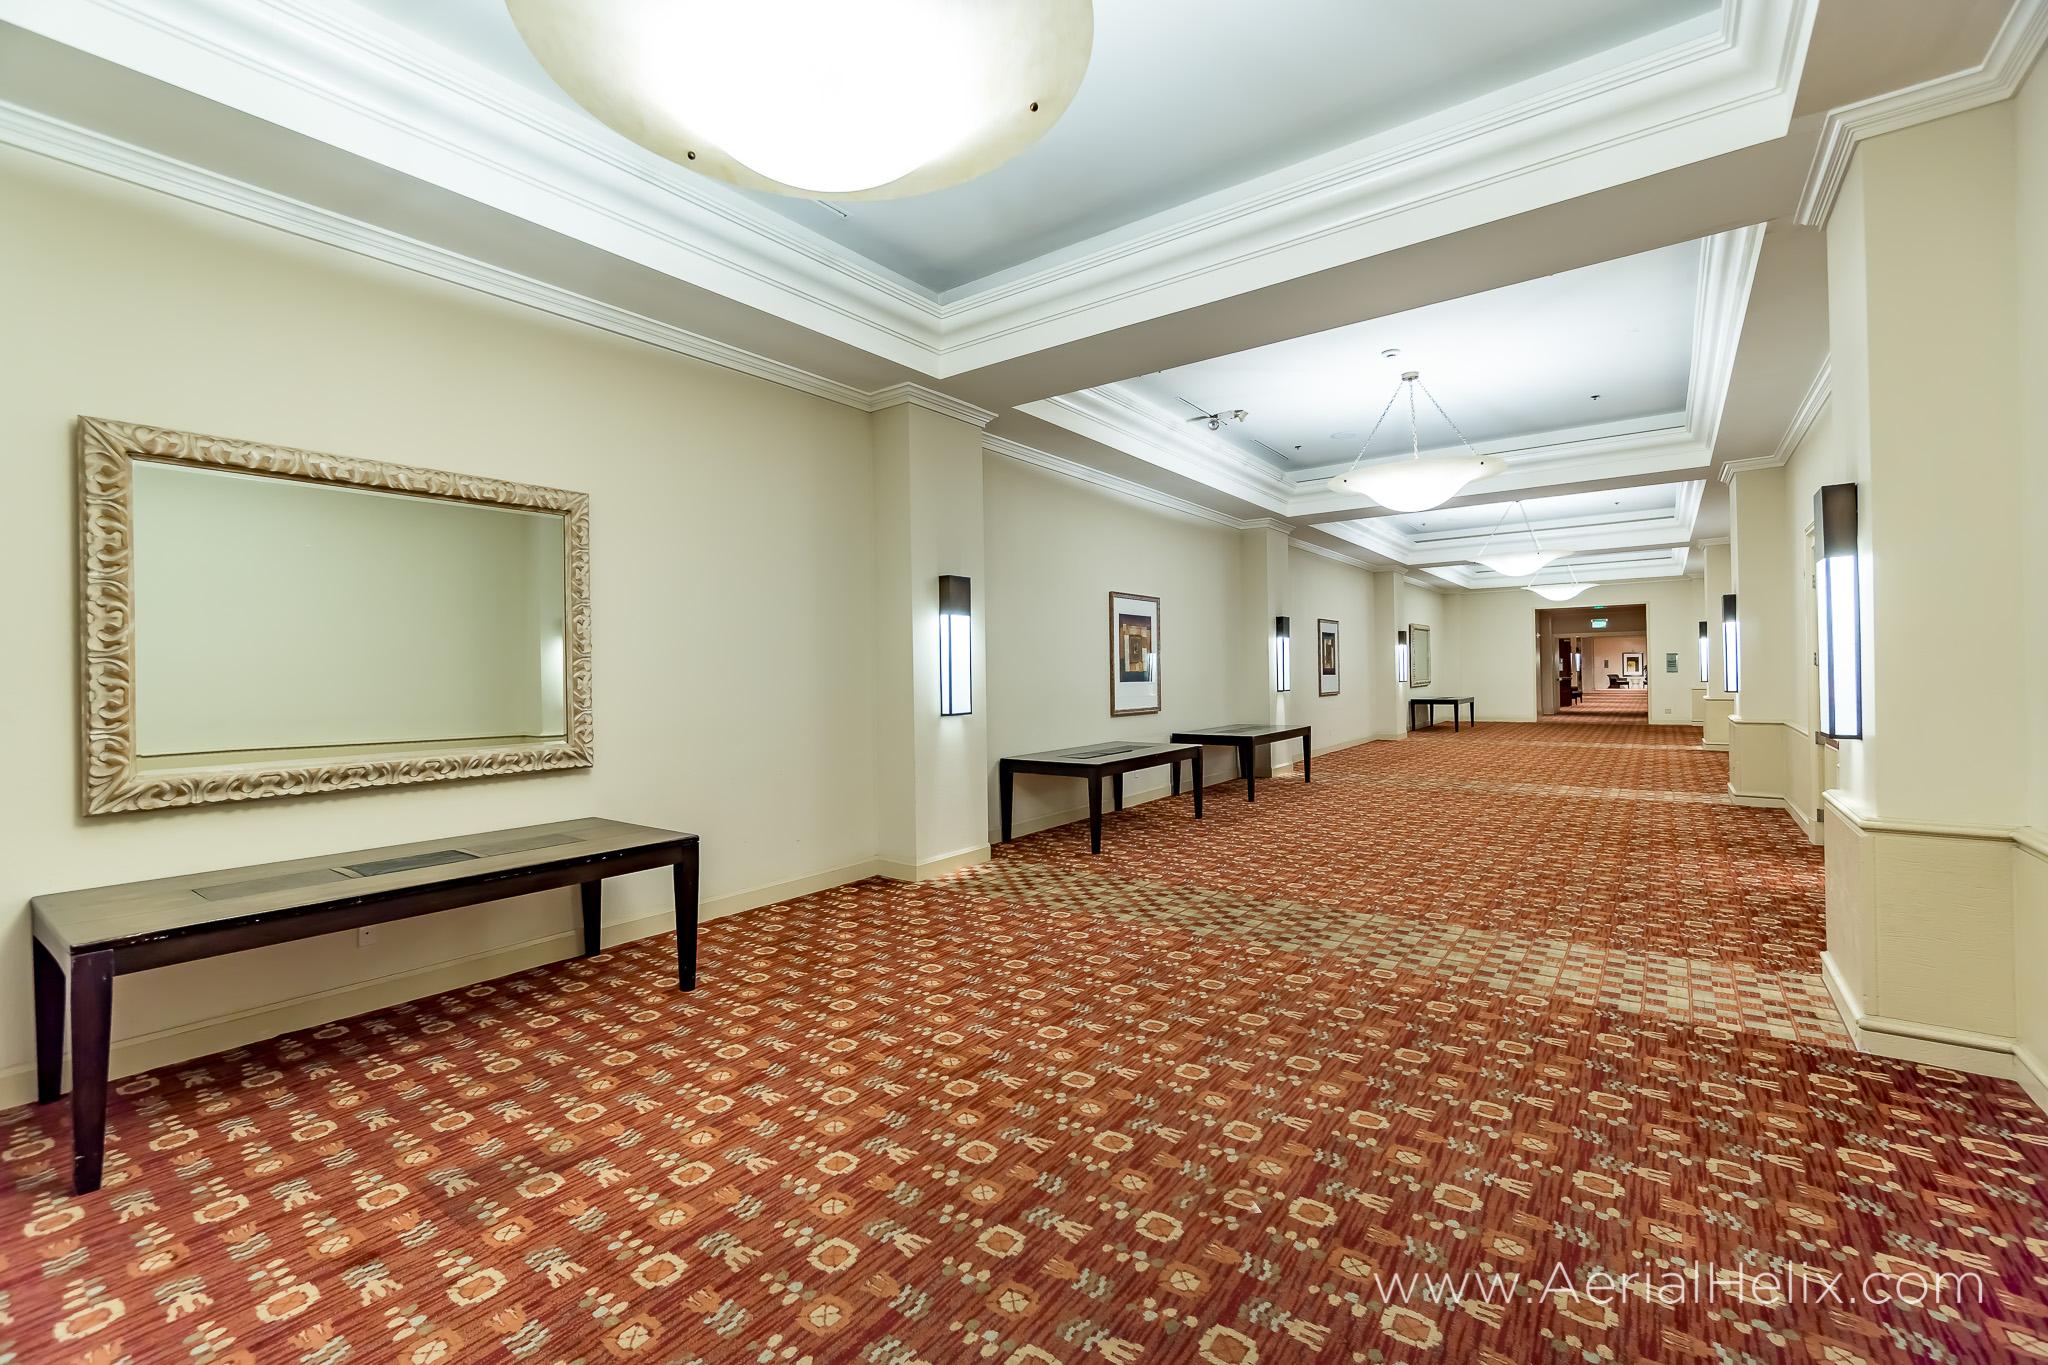 Indian Wells Hyatt Regency Set 1-18.jpg